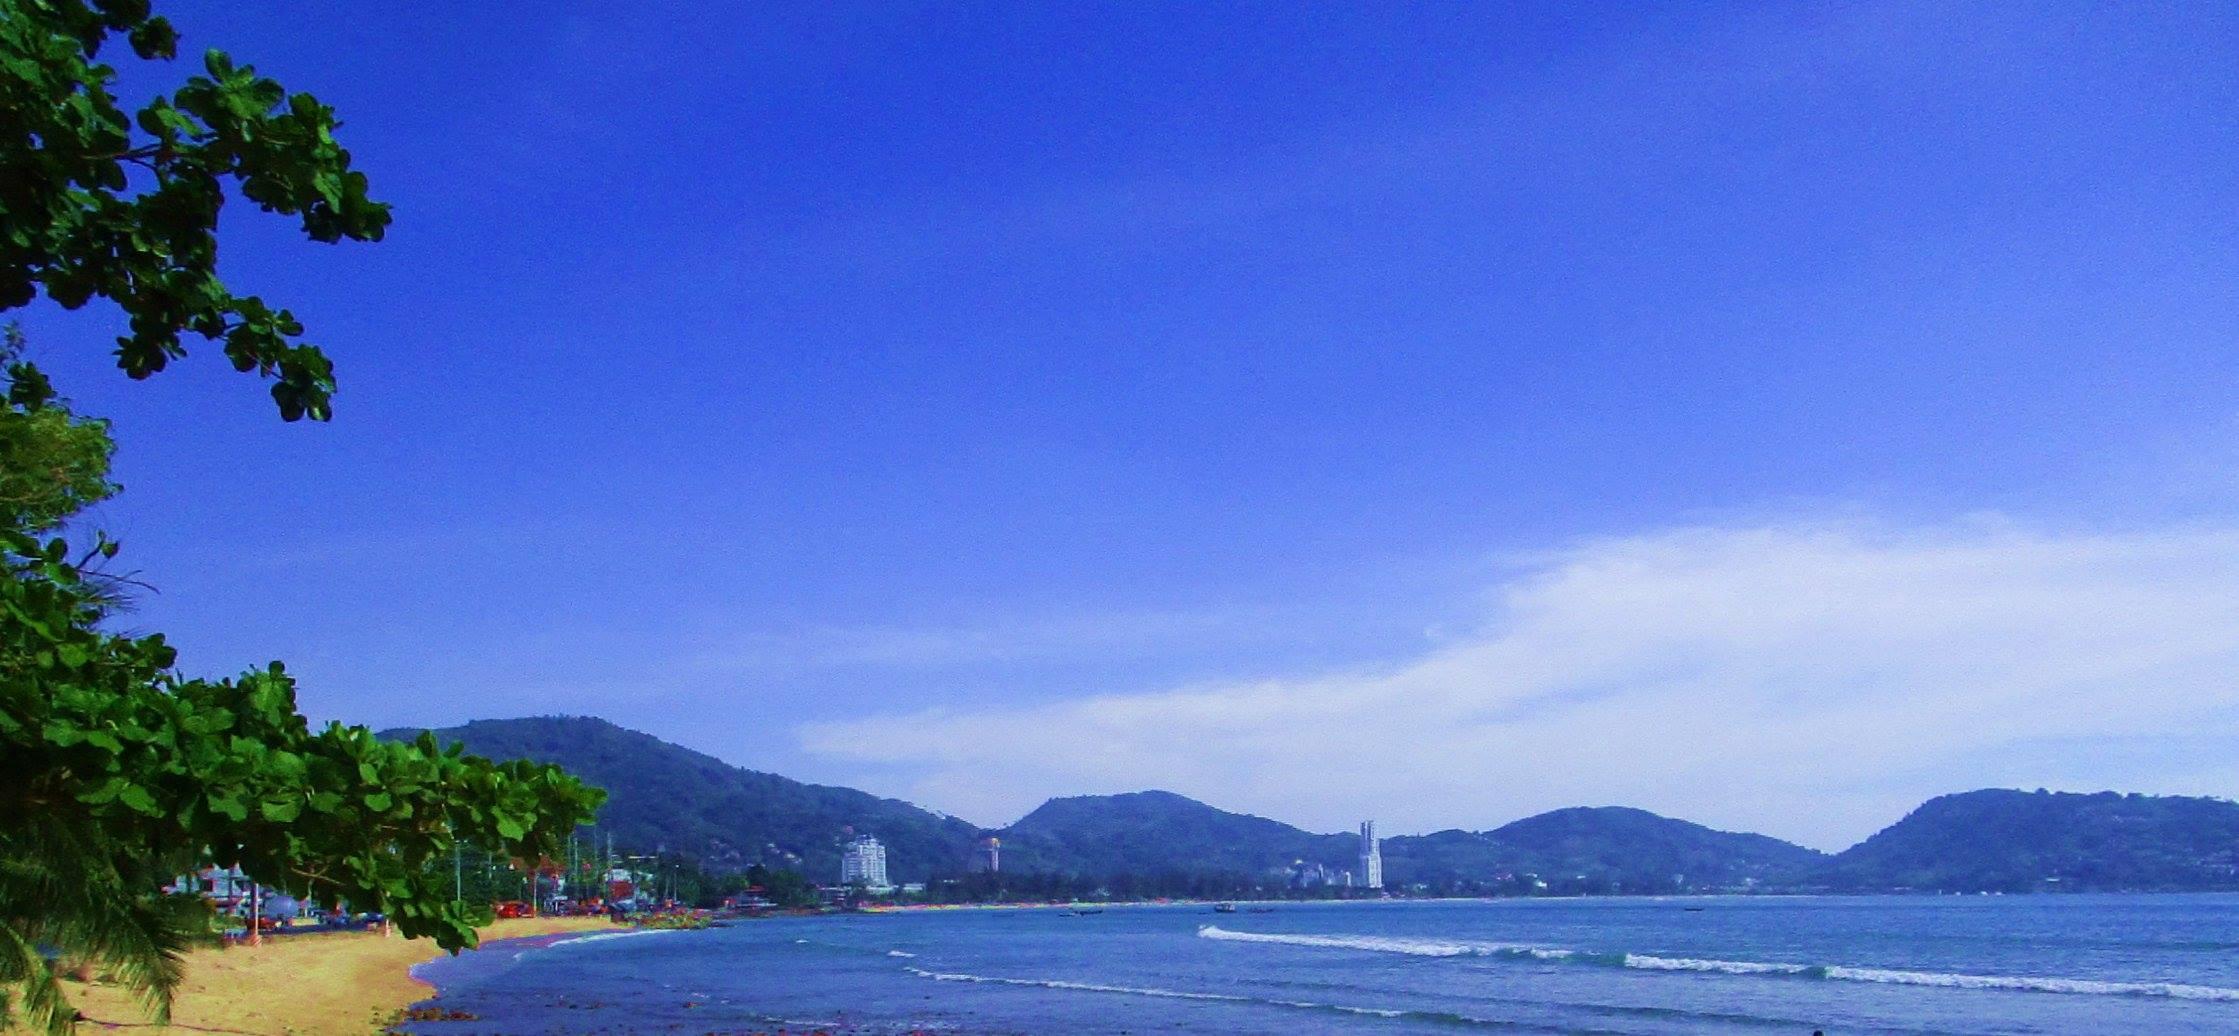 Phuket-Sea-160613b01